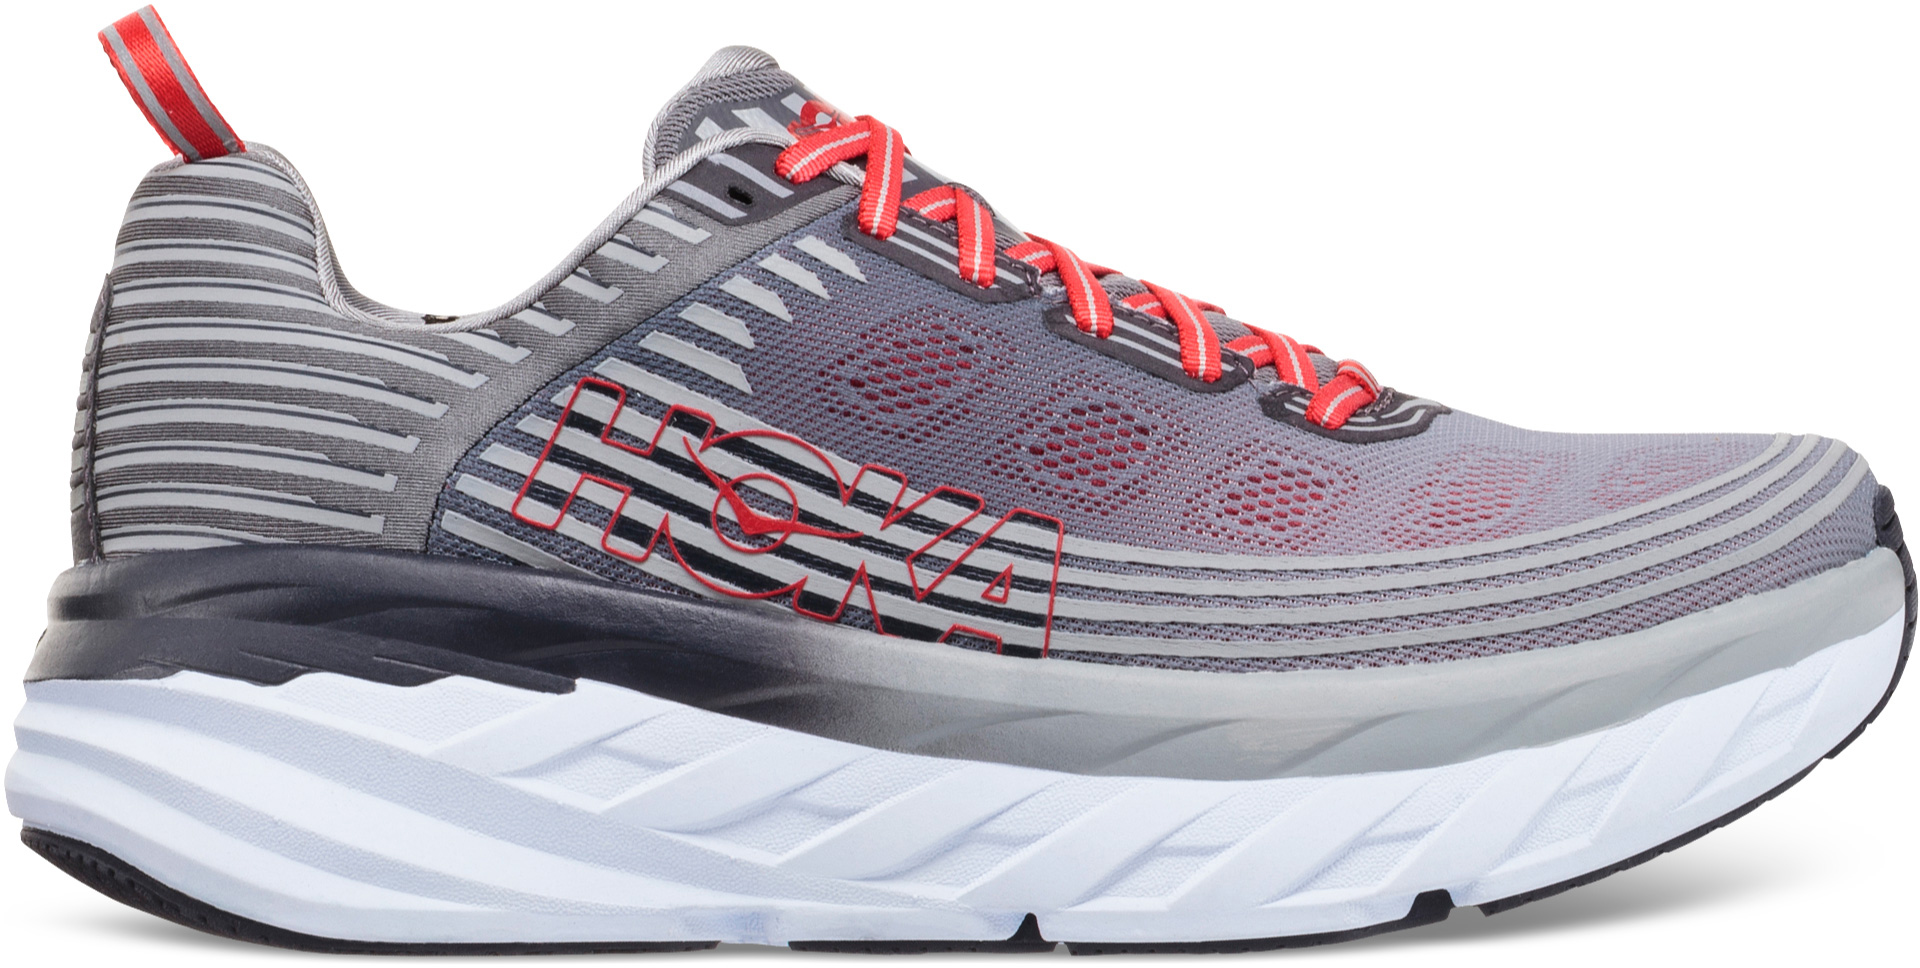 c3f875c1e427 Running shoes